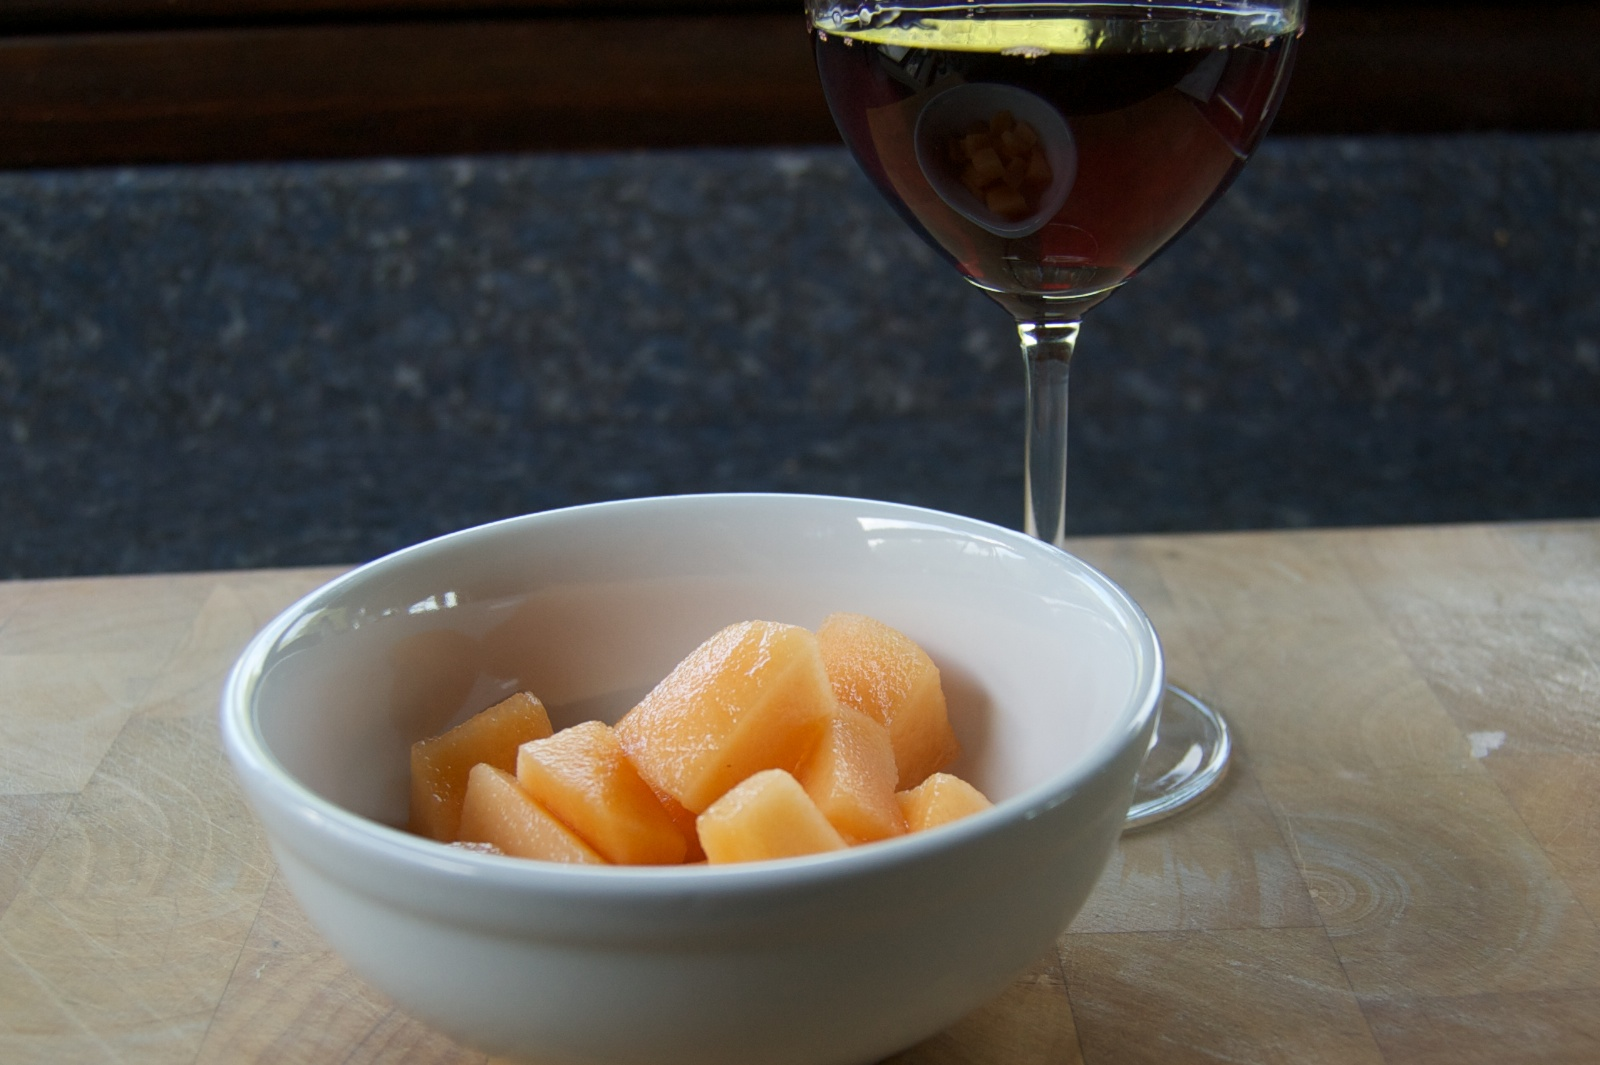 http://blog.rickk.com/food/2014/09/01/ate.2014.09.01.t.jpg